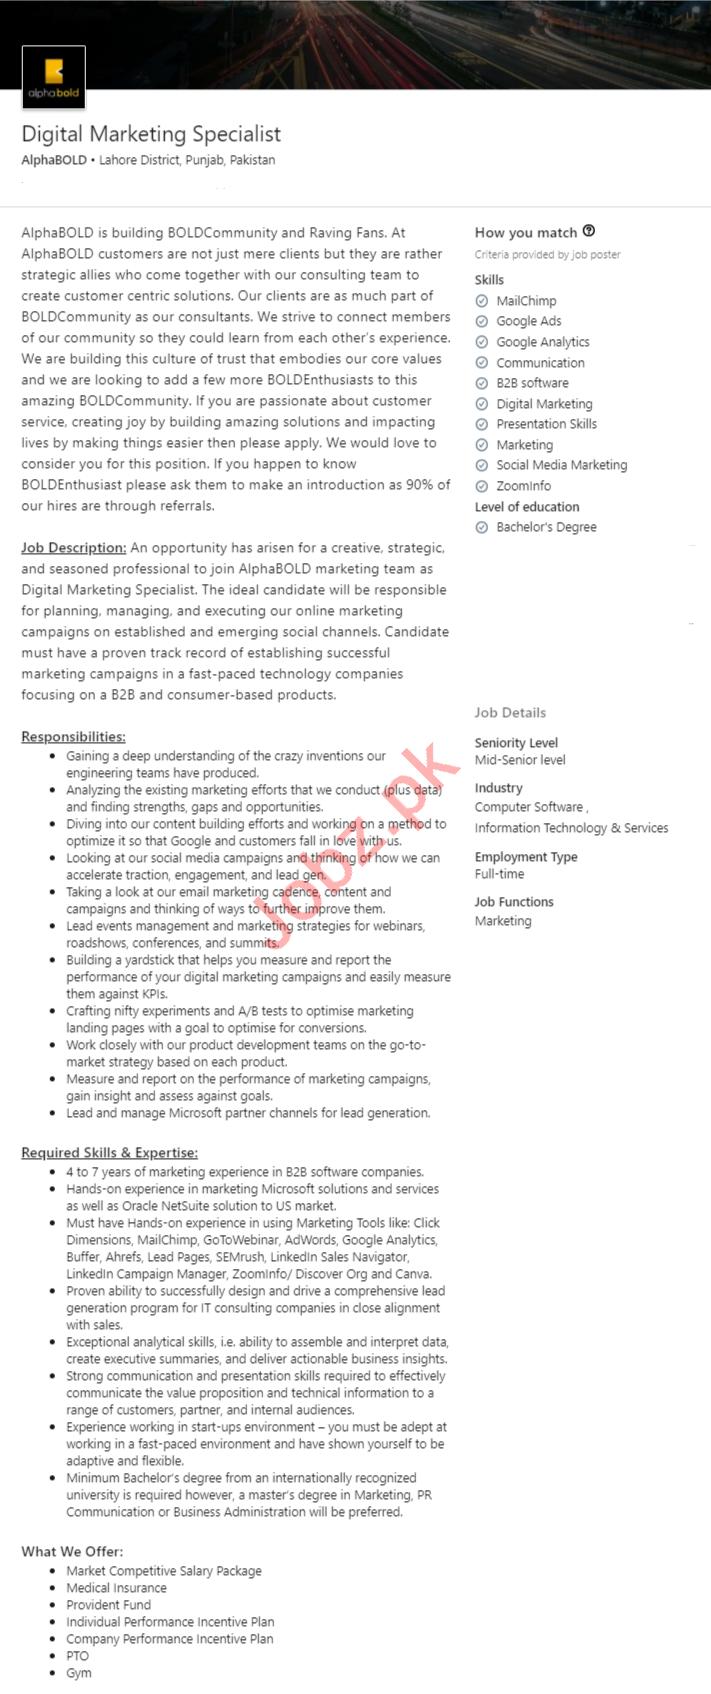 AlphaBOLD Lahore Jobs 2020 Digital Marketing Specialist